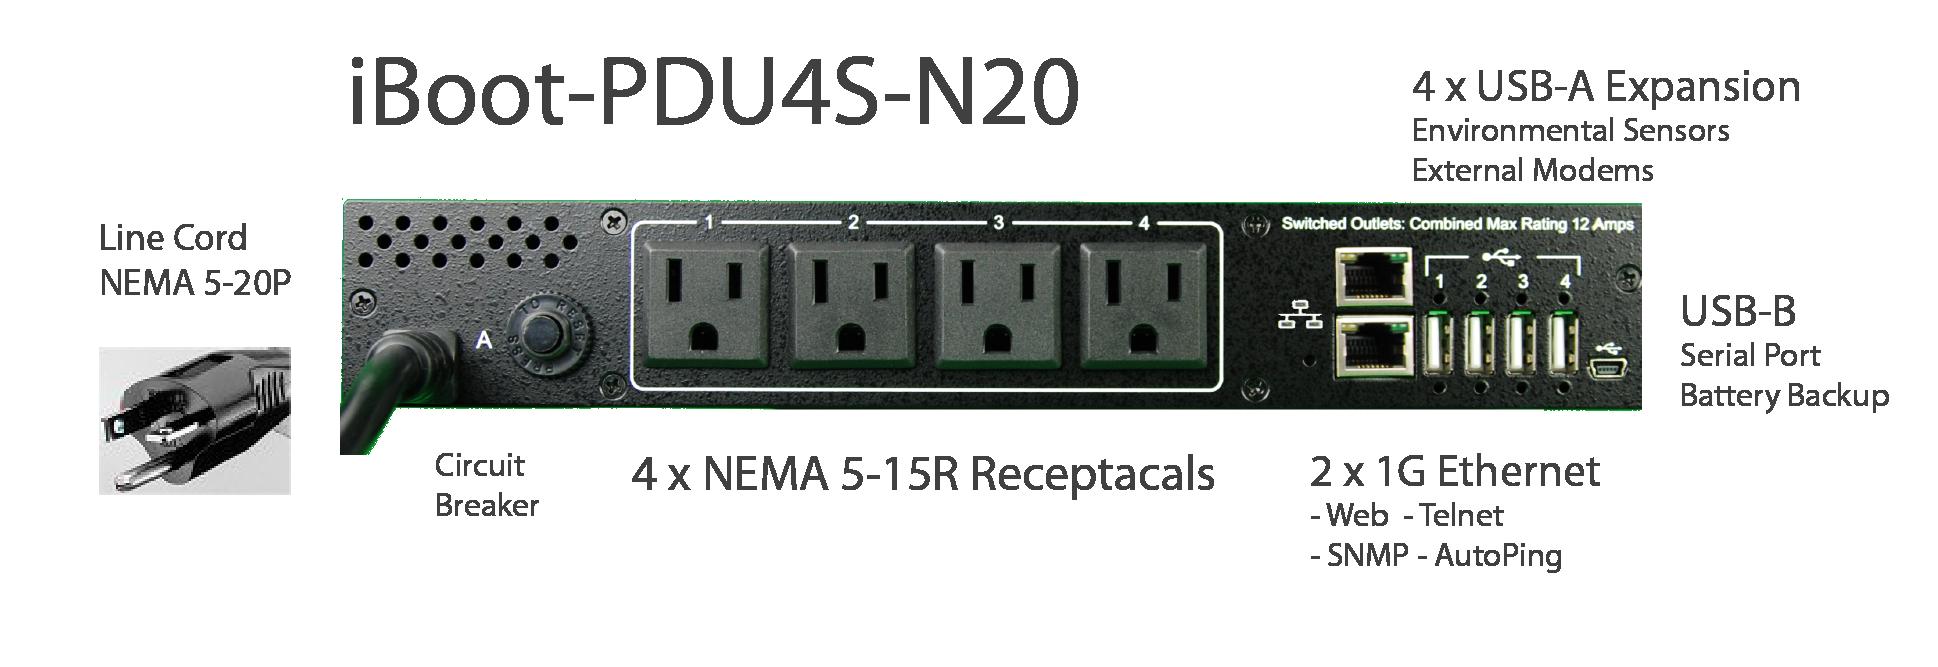 iBoot-PDU4S-N20 for Remote Reboot,1 x NEMA 5-15P.